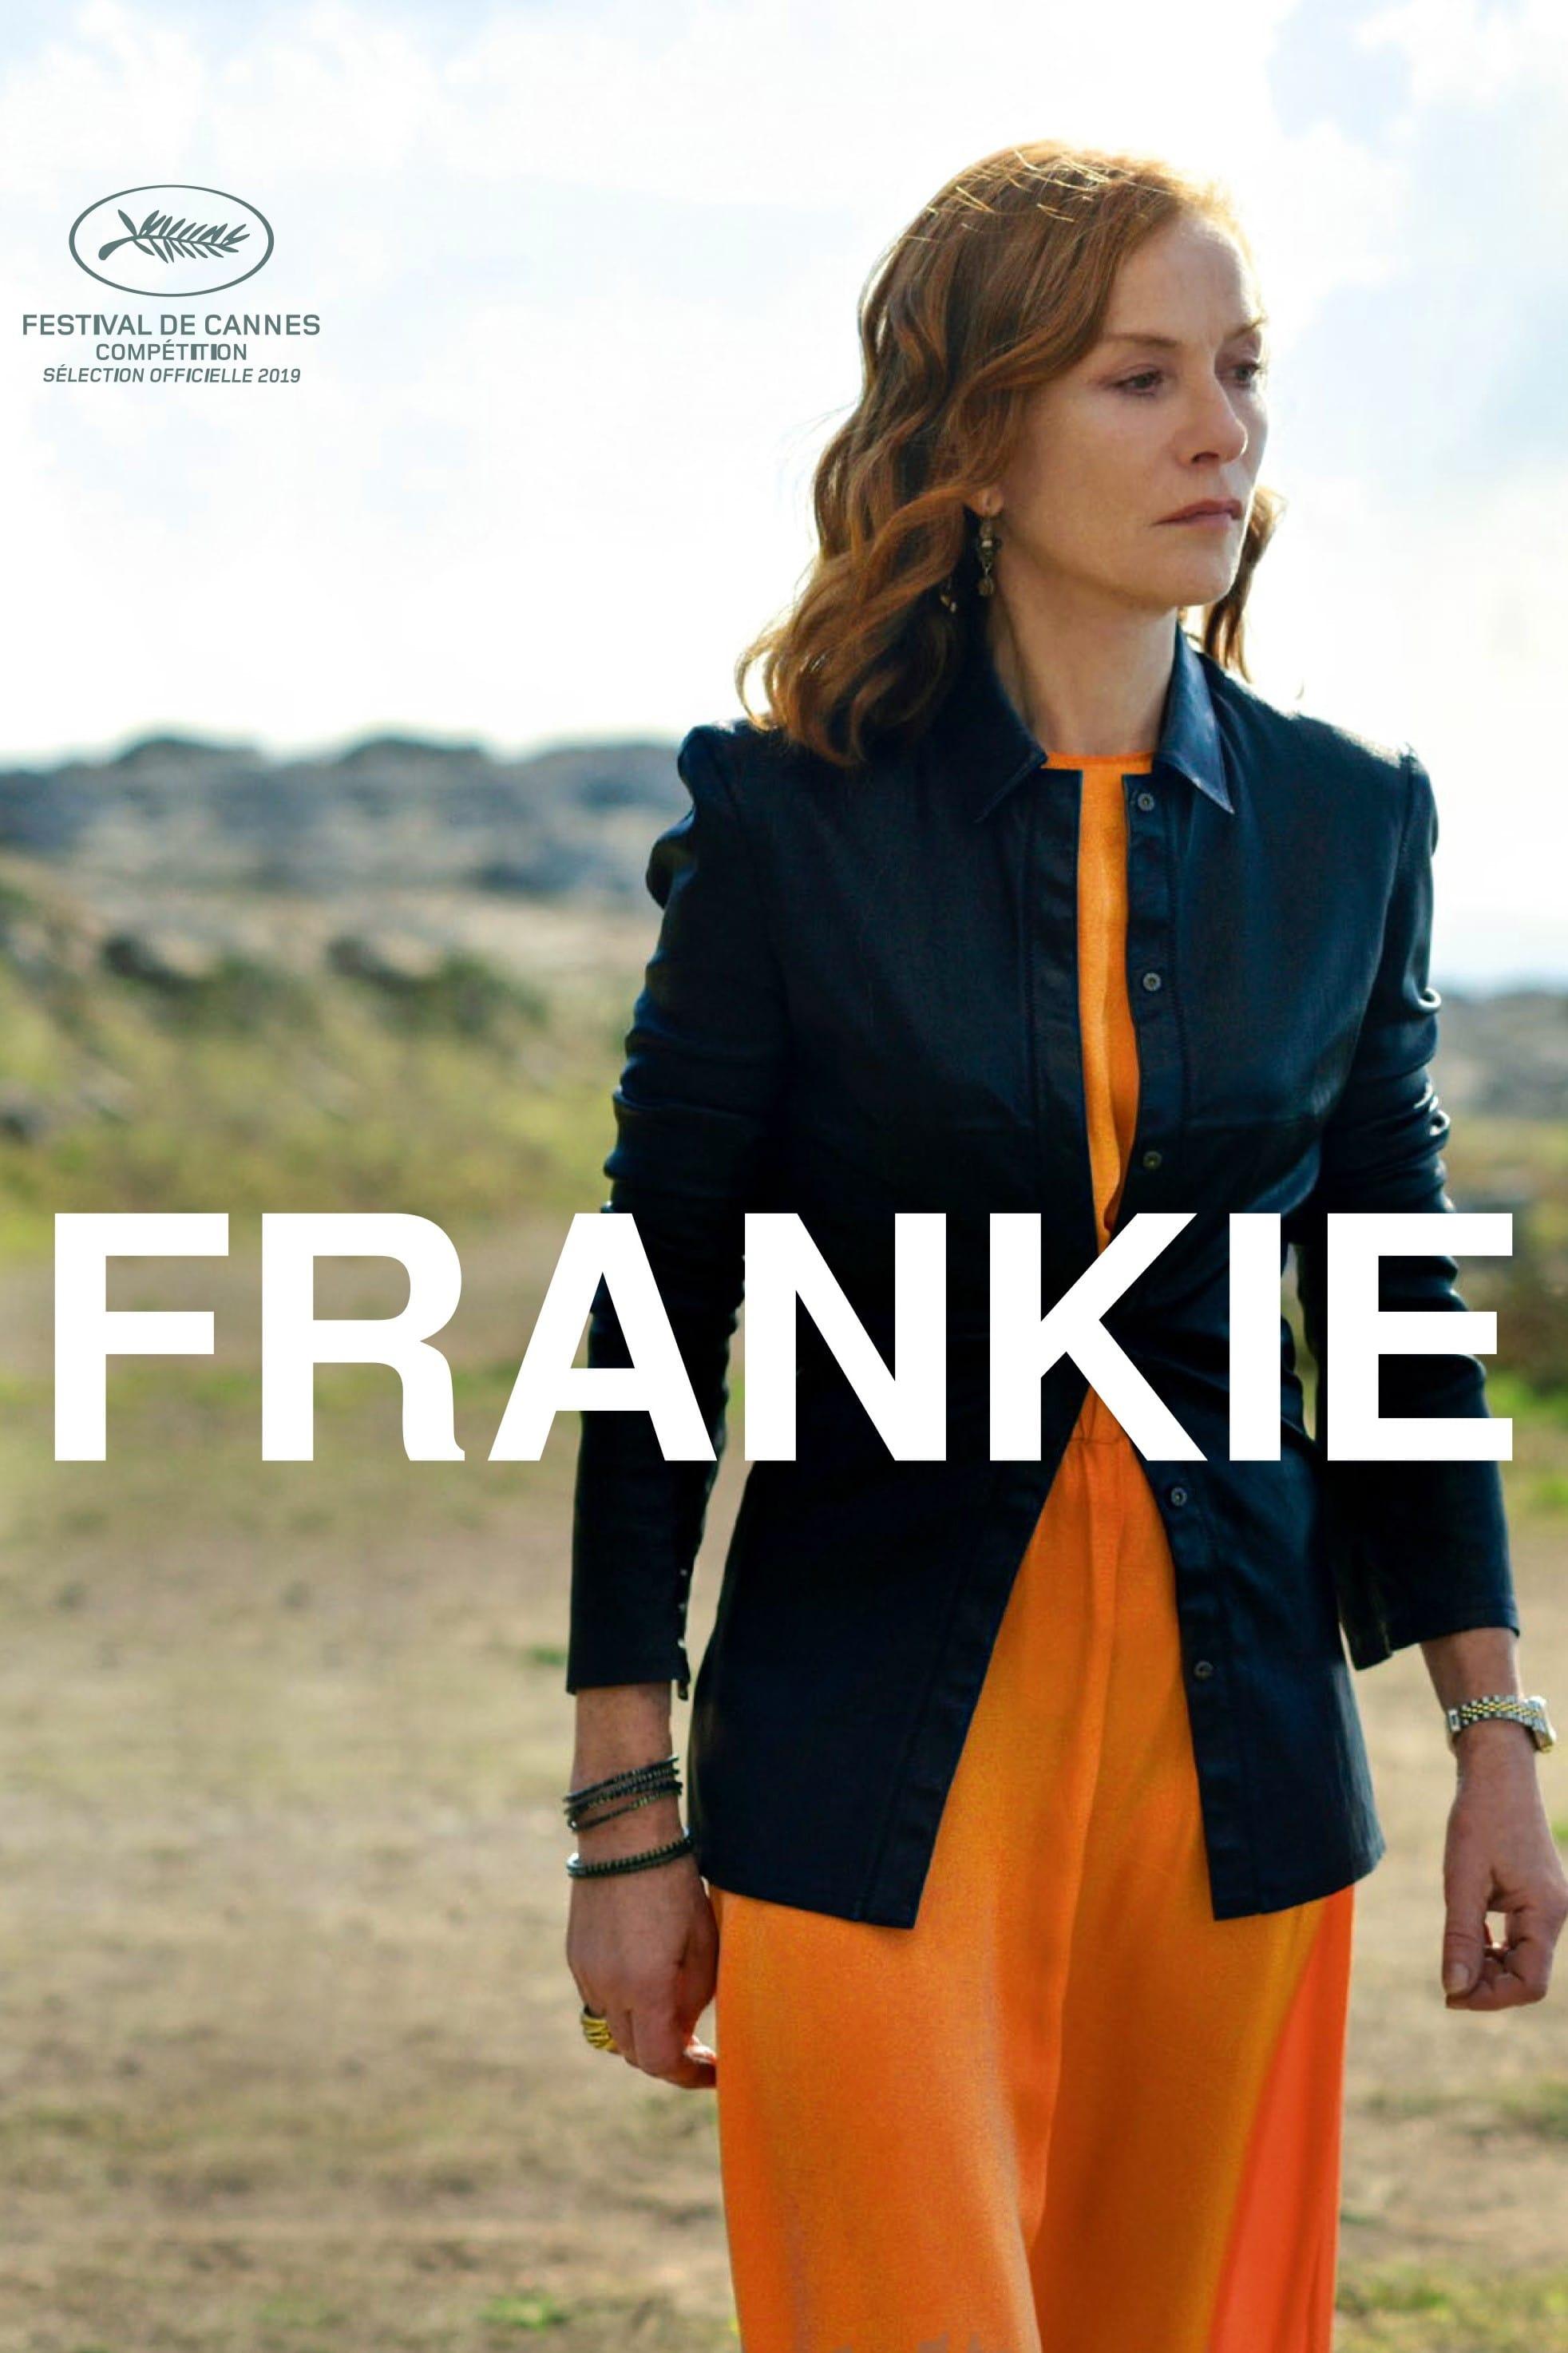 Frankie streaming sur zone telechargement